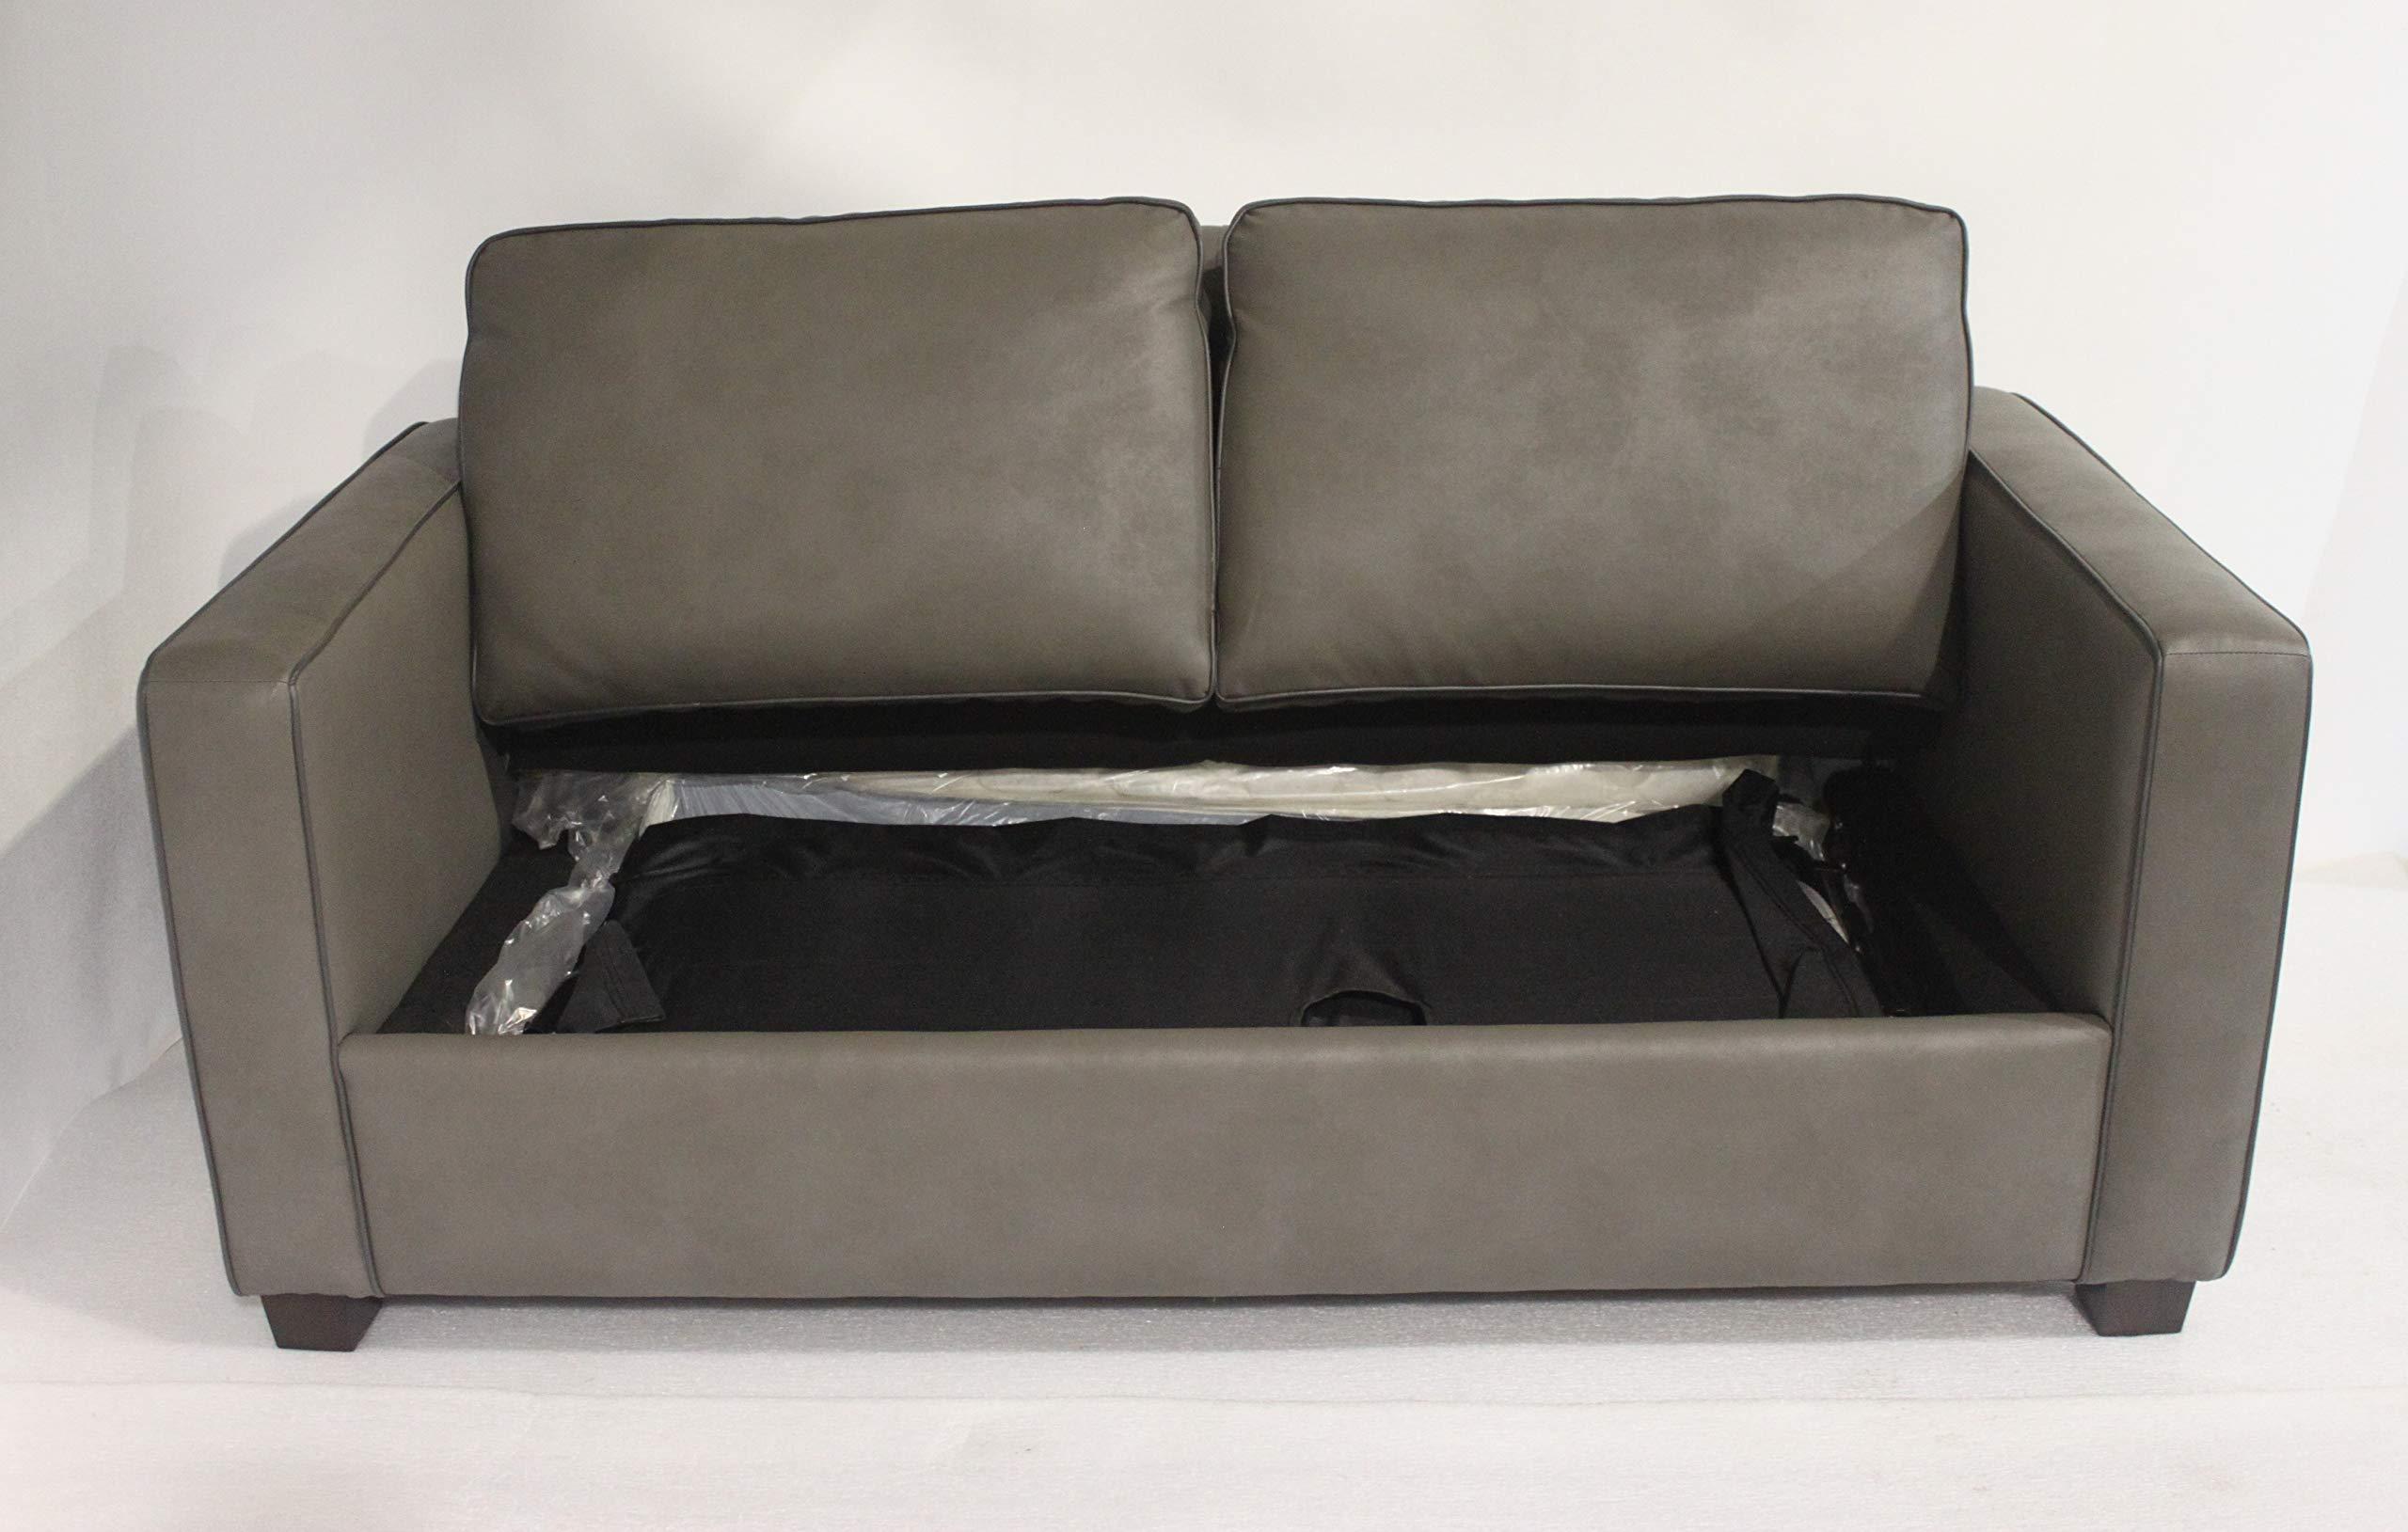 70 Quot La Z Boy Rv Camper Sleeper Sofa Couch Hide A Bed England Furniture Lazy Boy